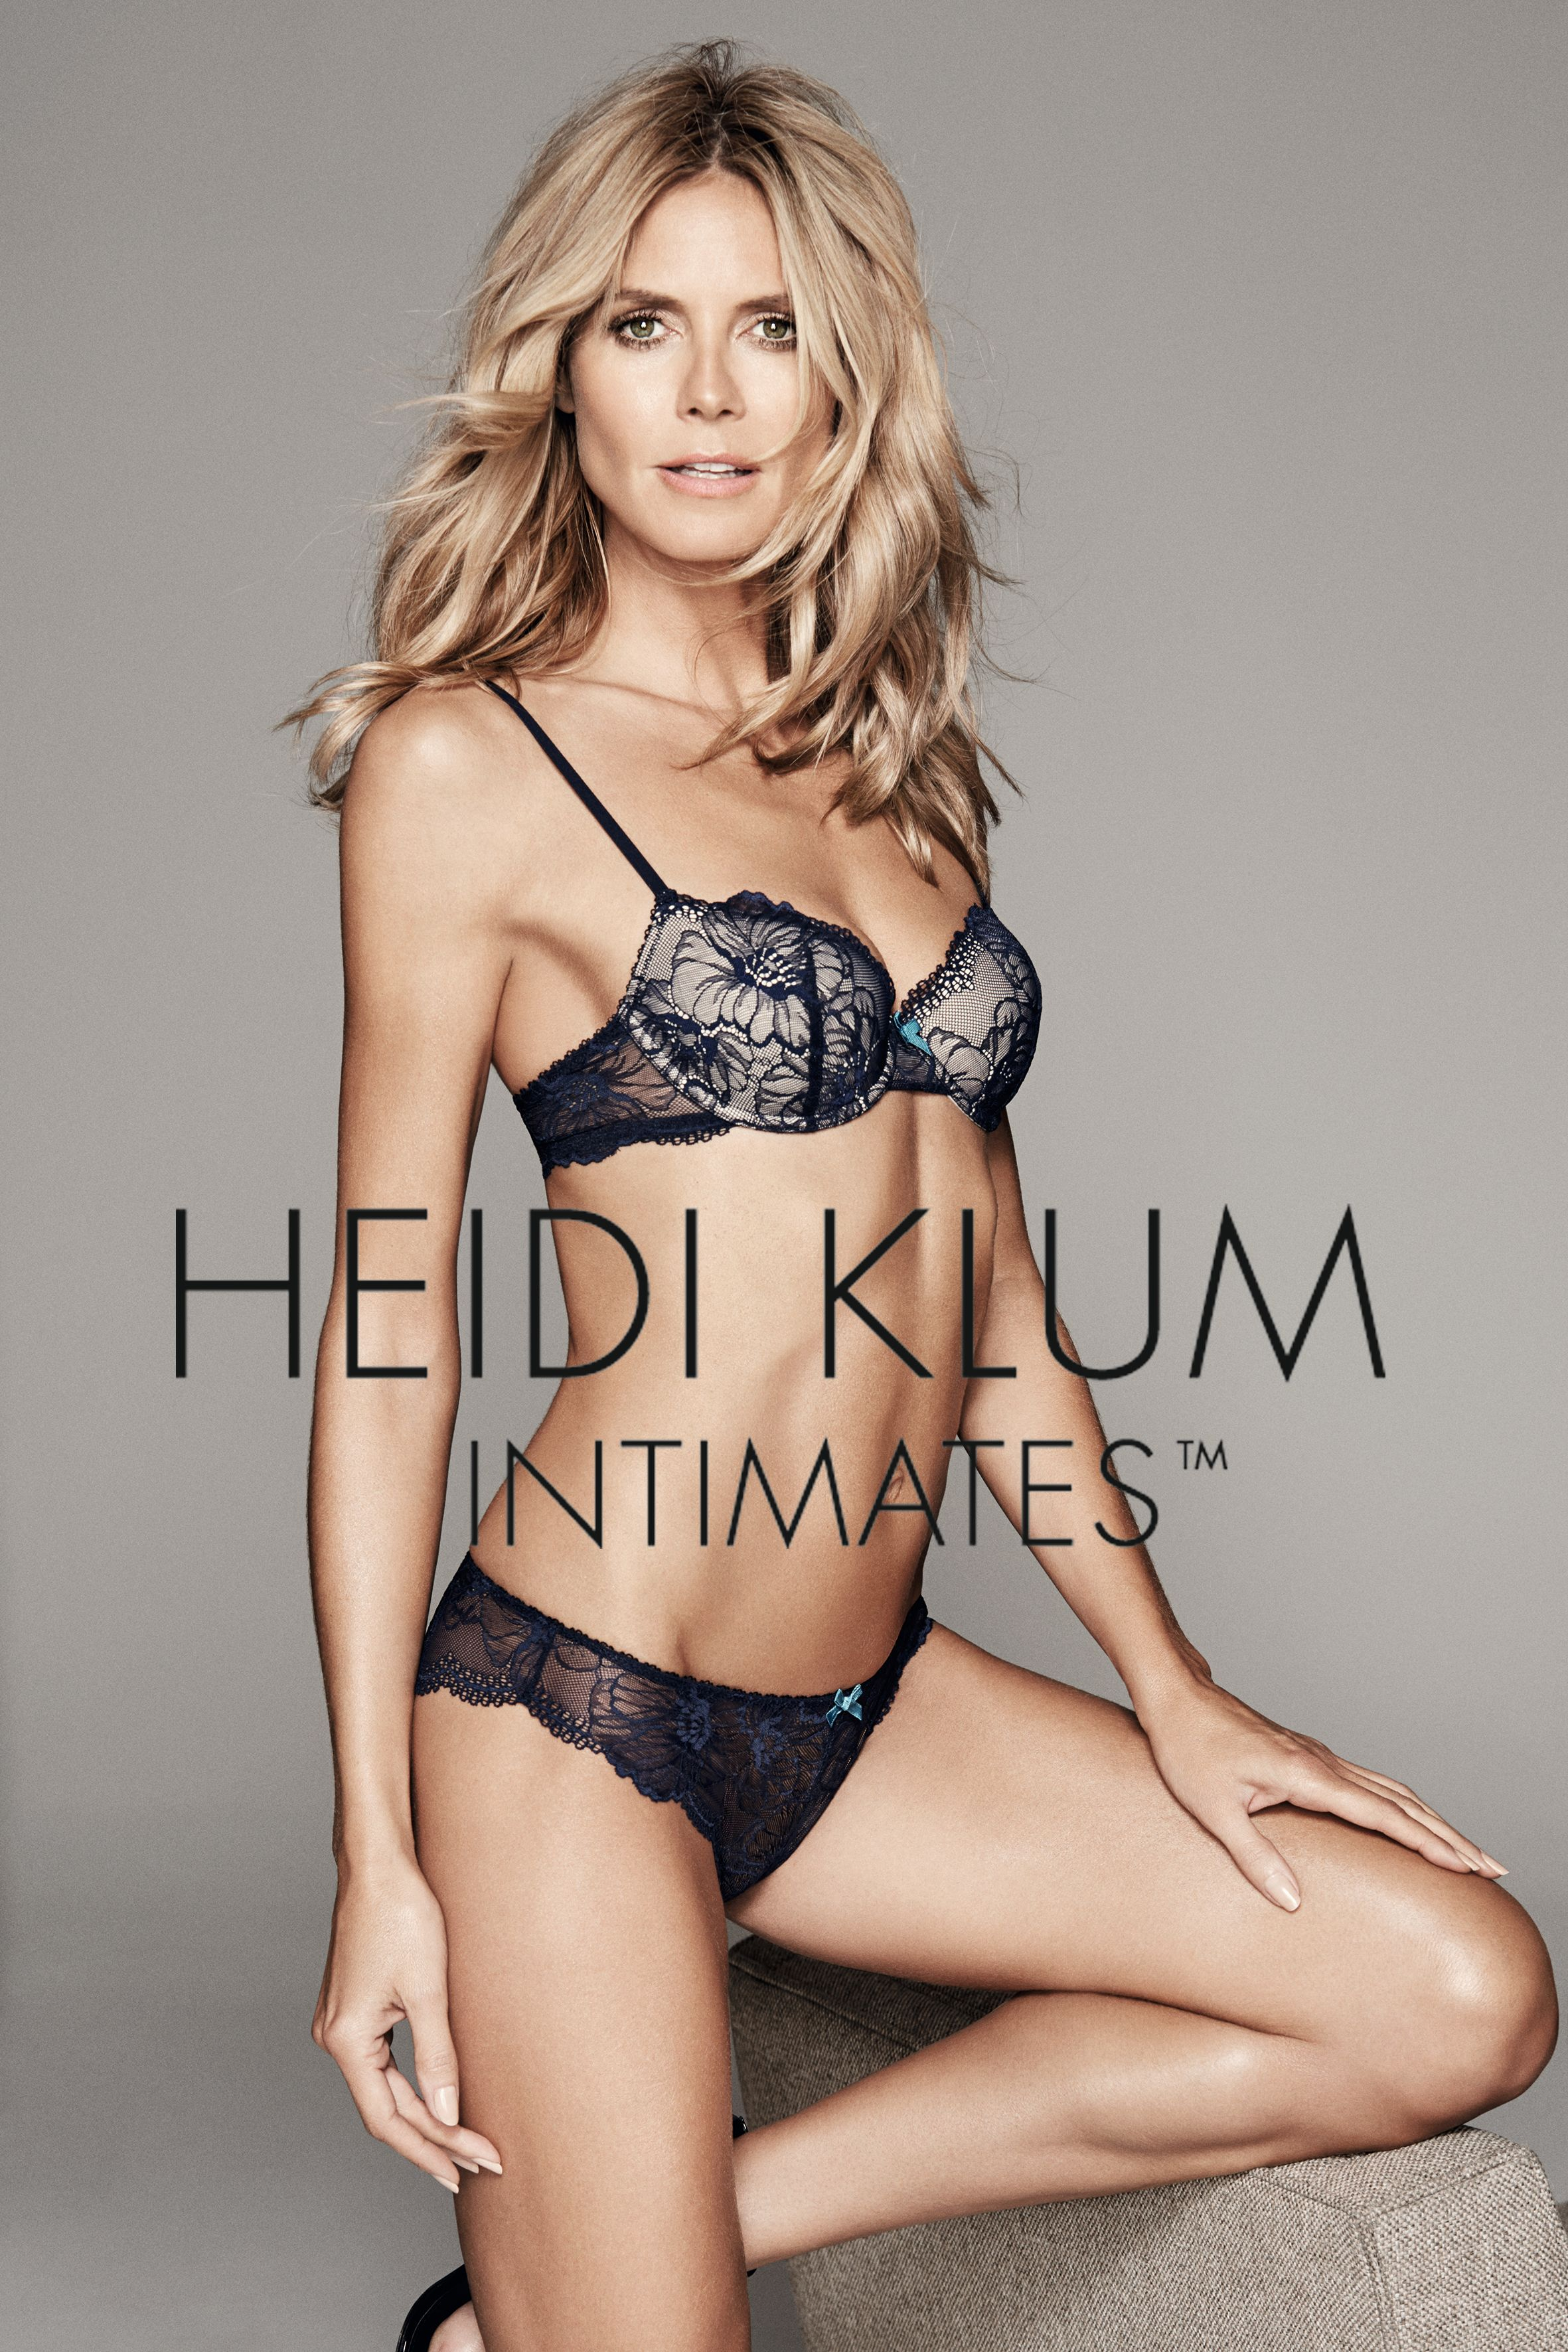 Nice Images Collection: Heidi Klum Desktop Wallpapers